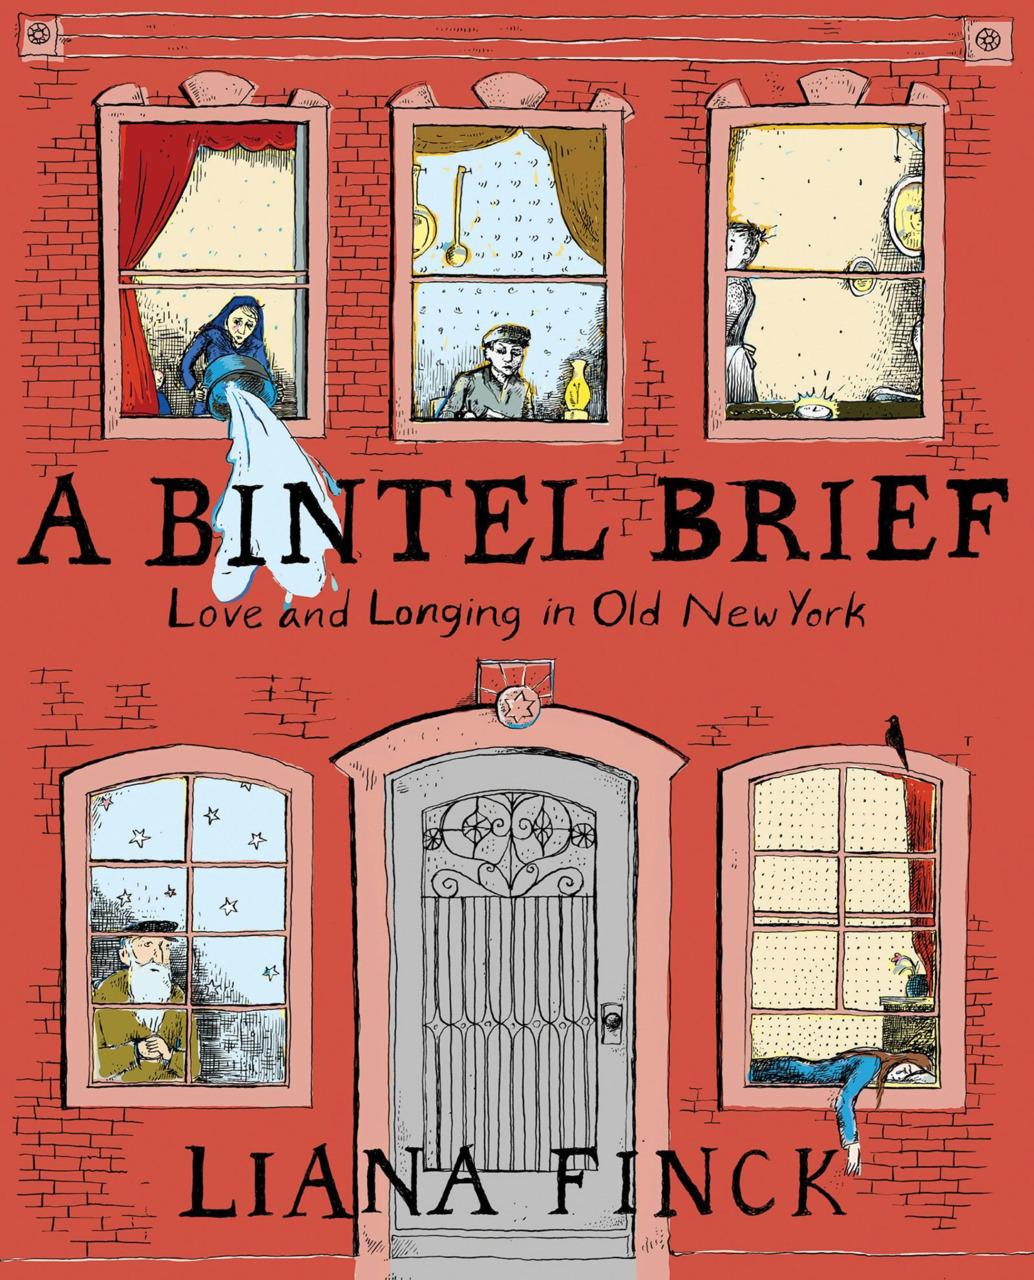 A Bintel Brief by Liana Finick